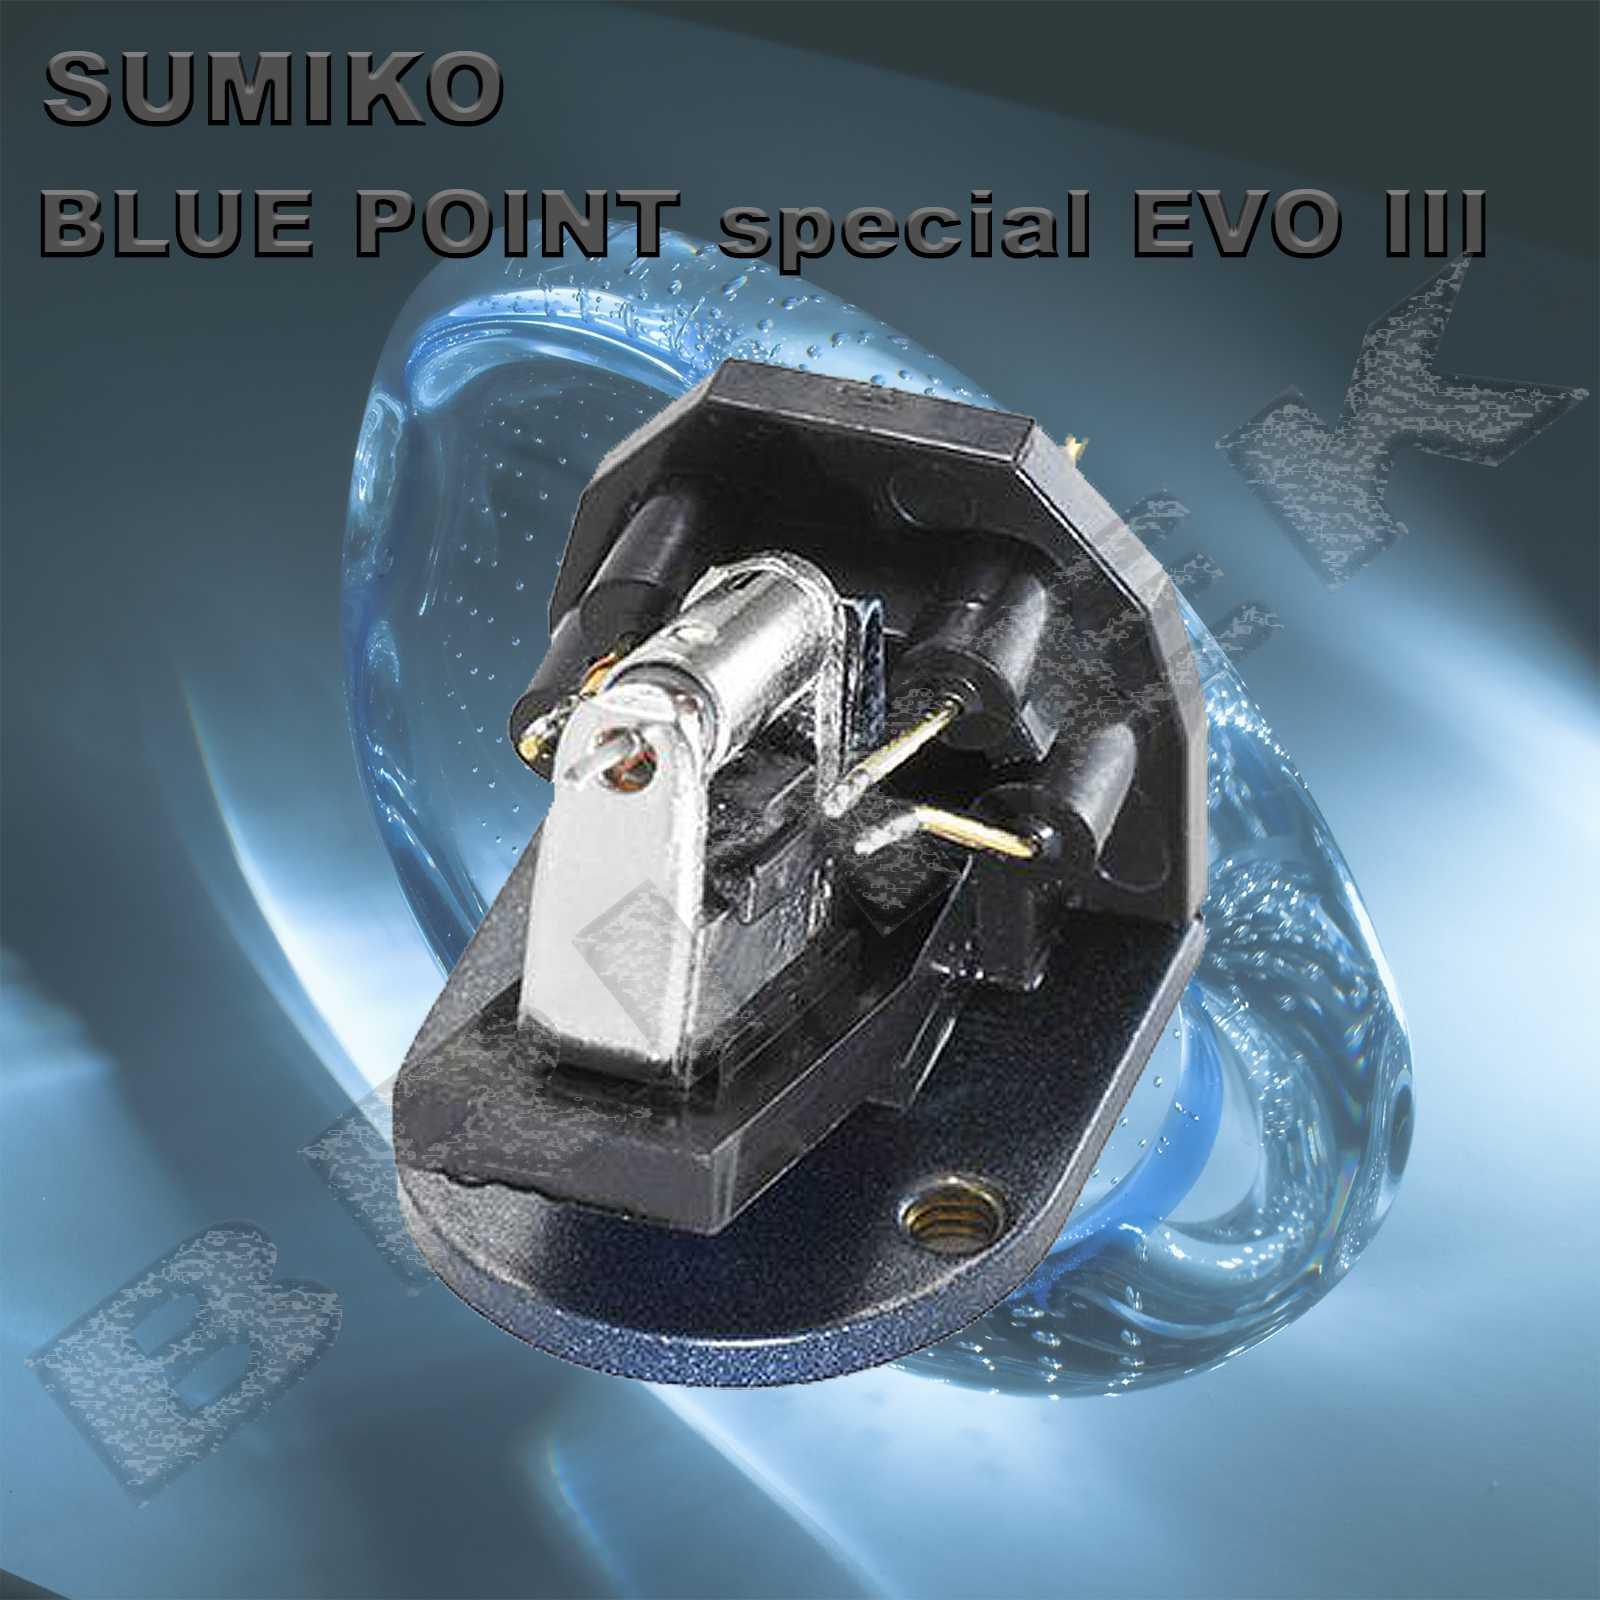 Sumiko Blue Point Special EVO III H (2.5 mV)